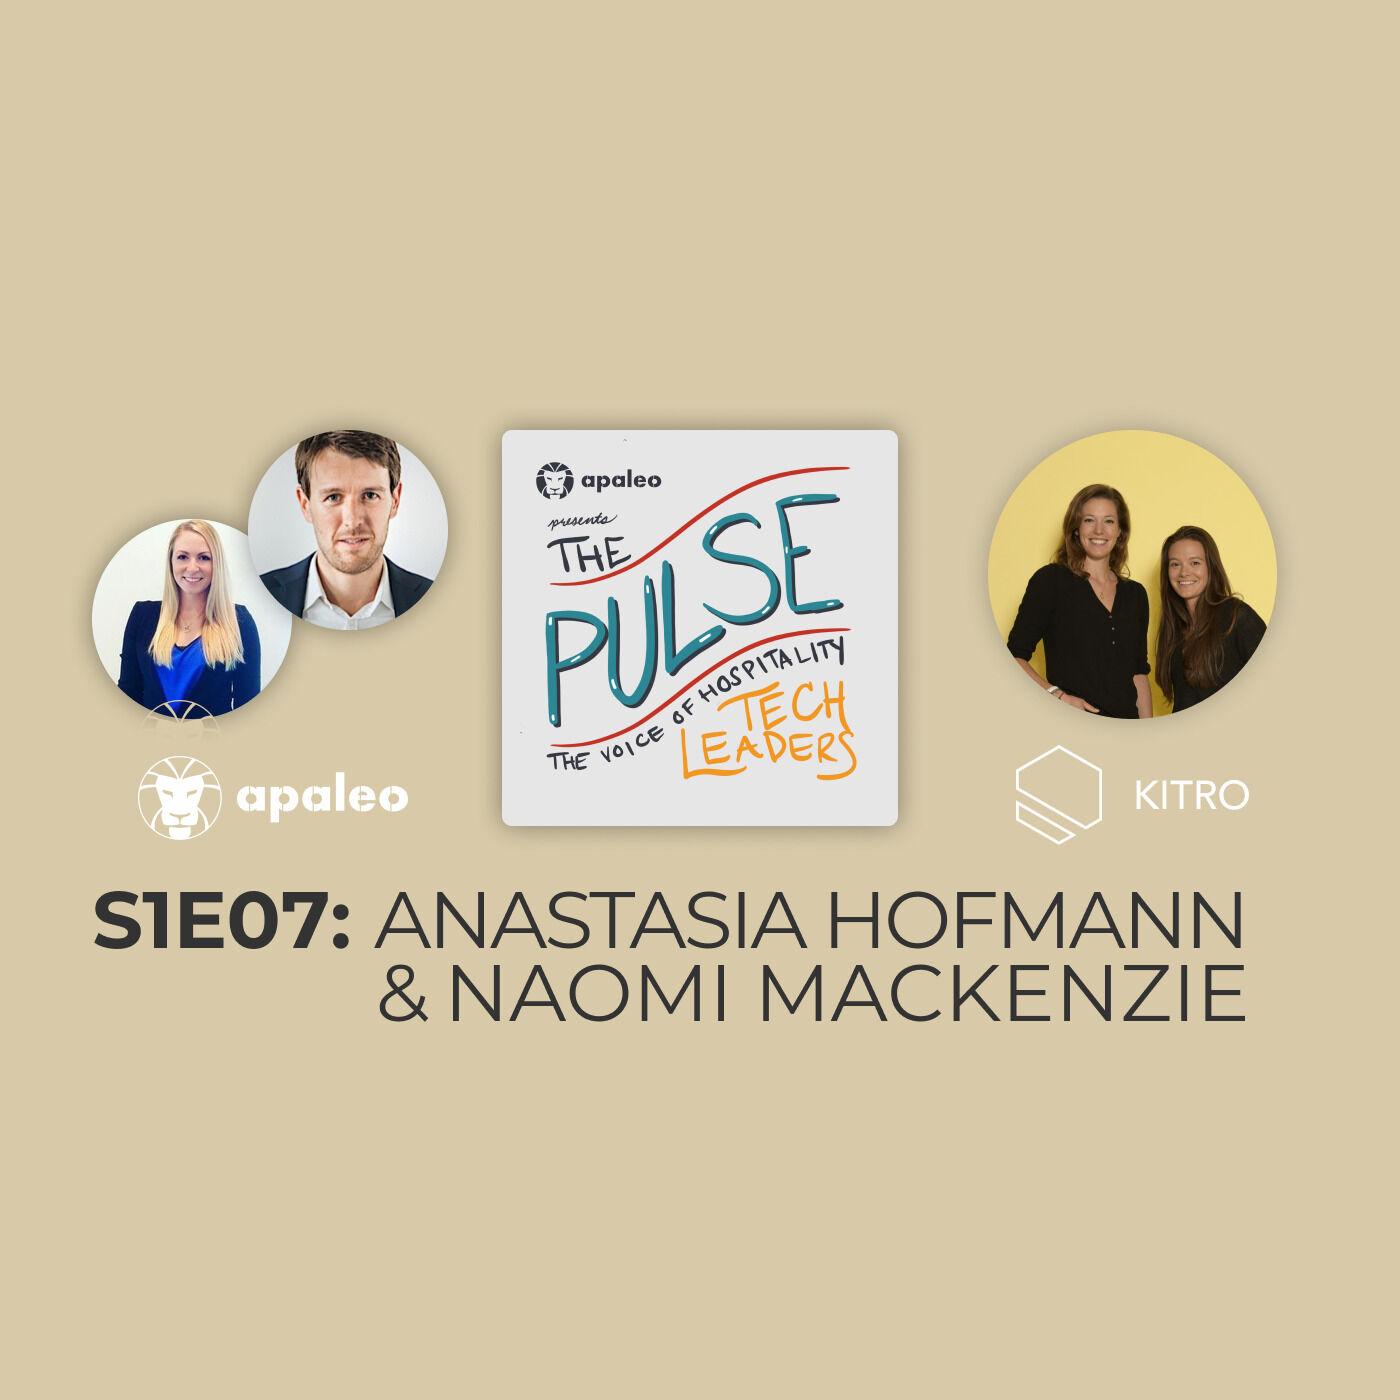 """Building an AI-focused startup in a non-digital industry"" KITRO's Anastasia Hofmann & Naomi MacKenzie"